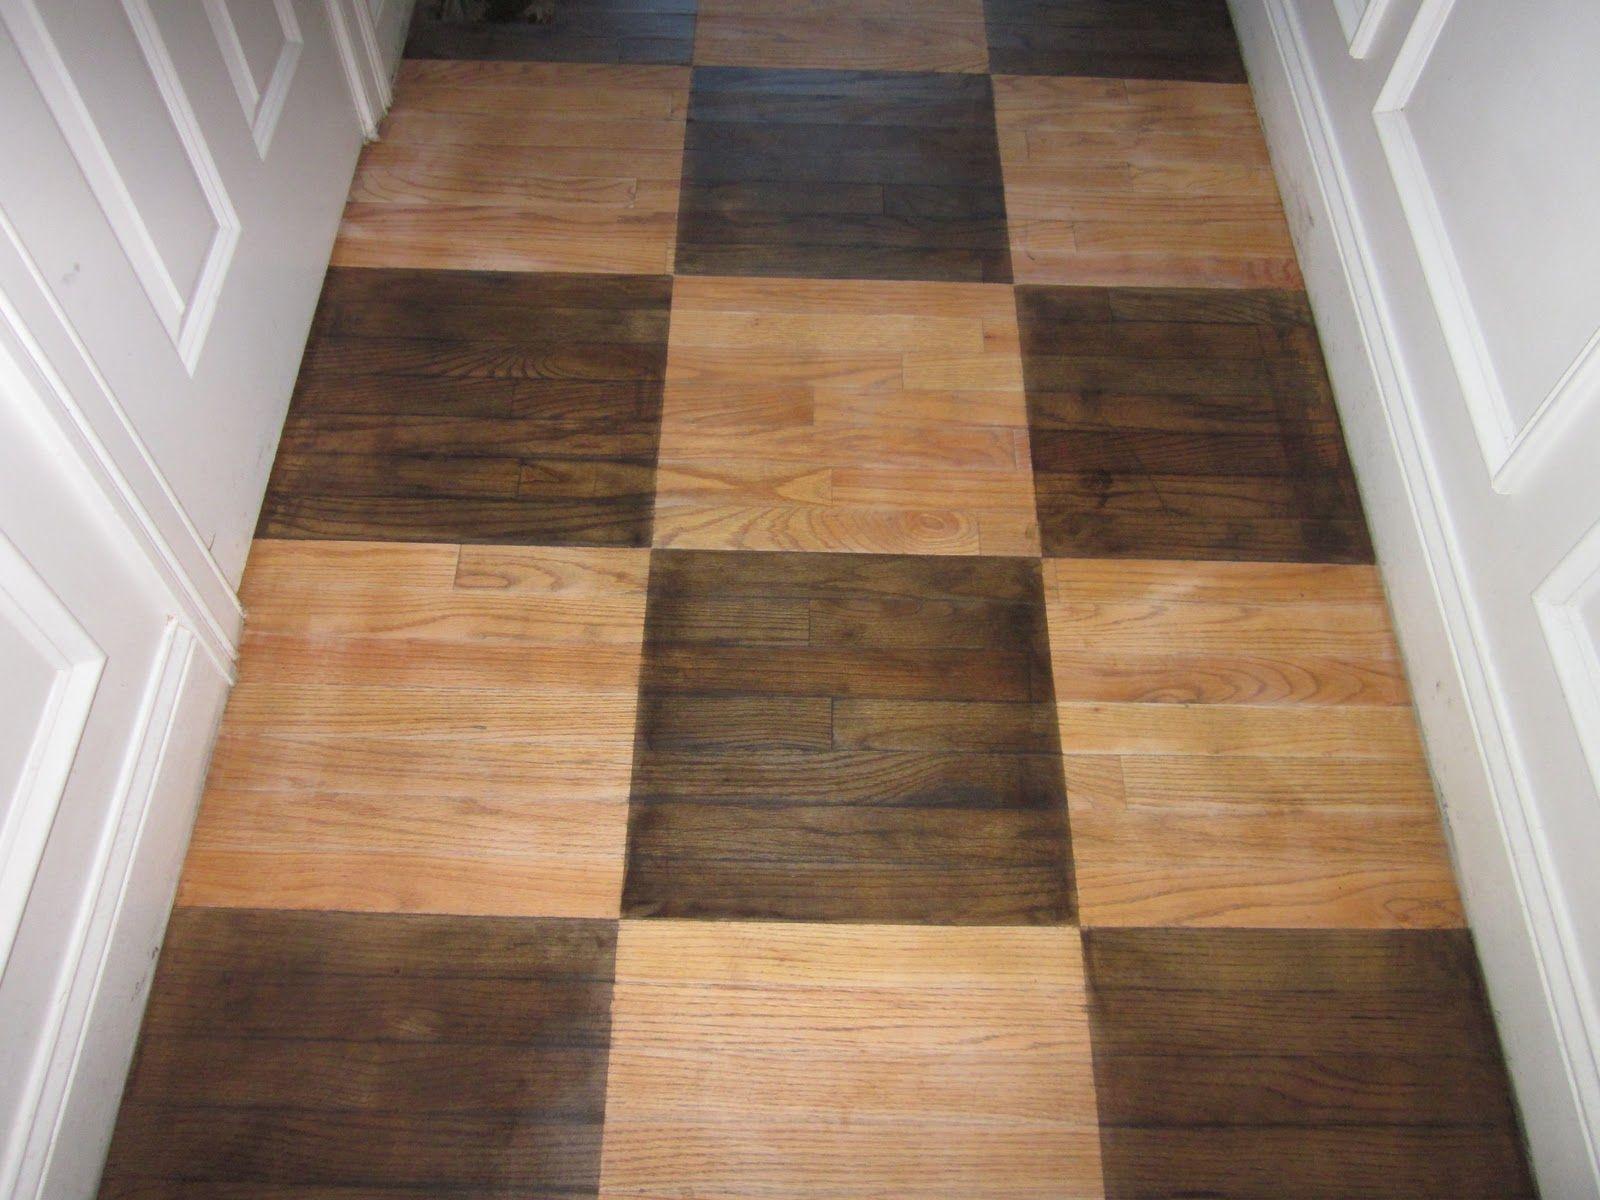 How To Paint A Rug On Wood Floors Painted Rug Flooring Wood Floors